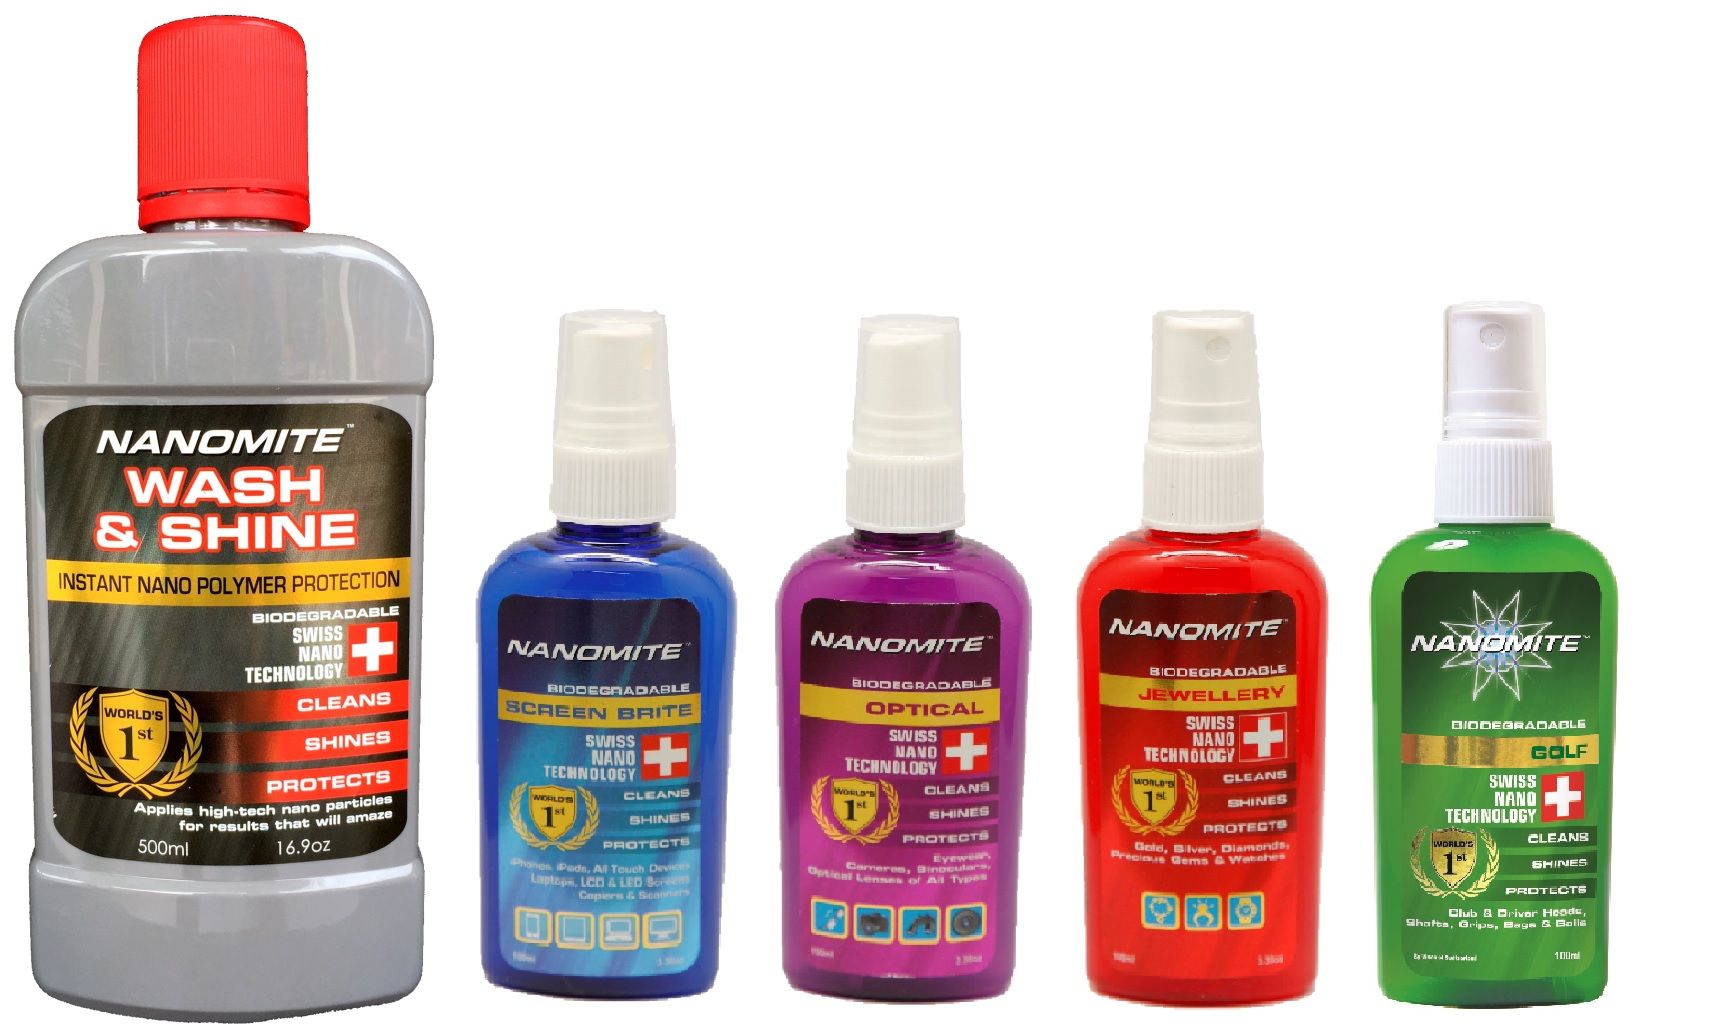 Nanomite Product Range Photo-New